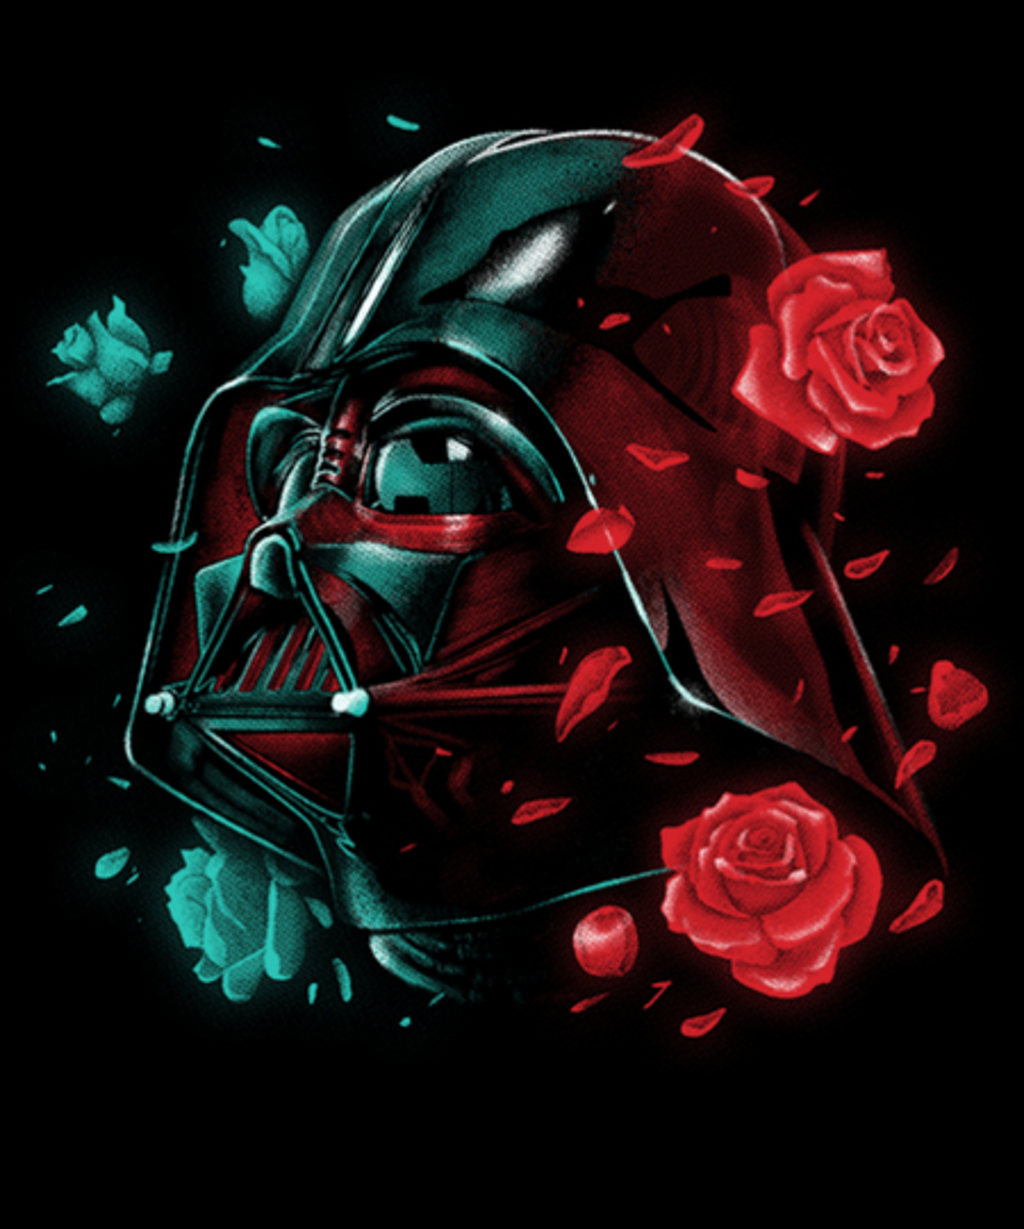 Qwertee: Dark Side of the Bloom